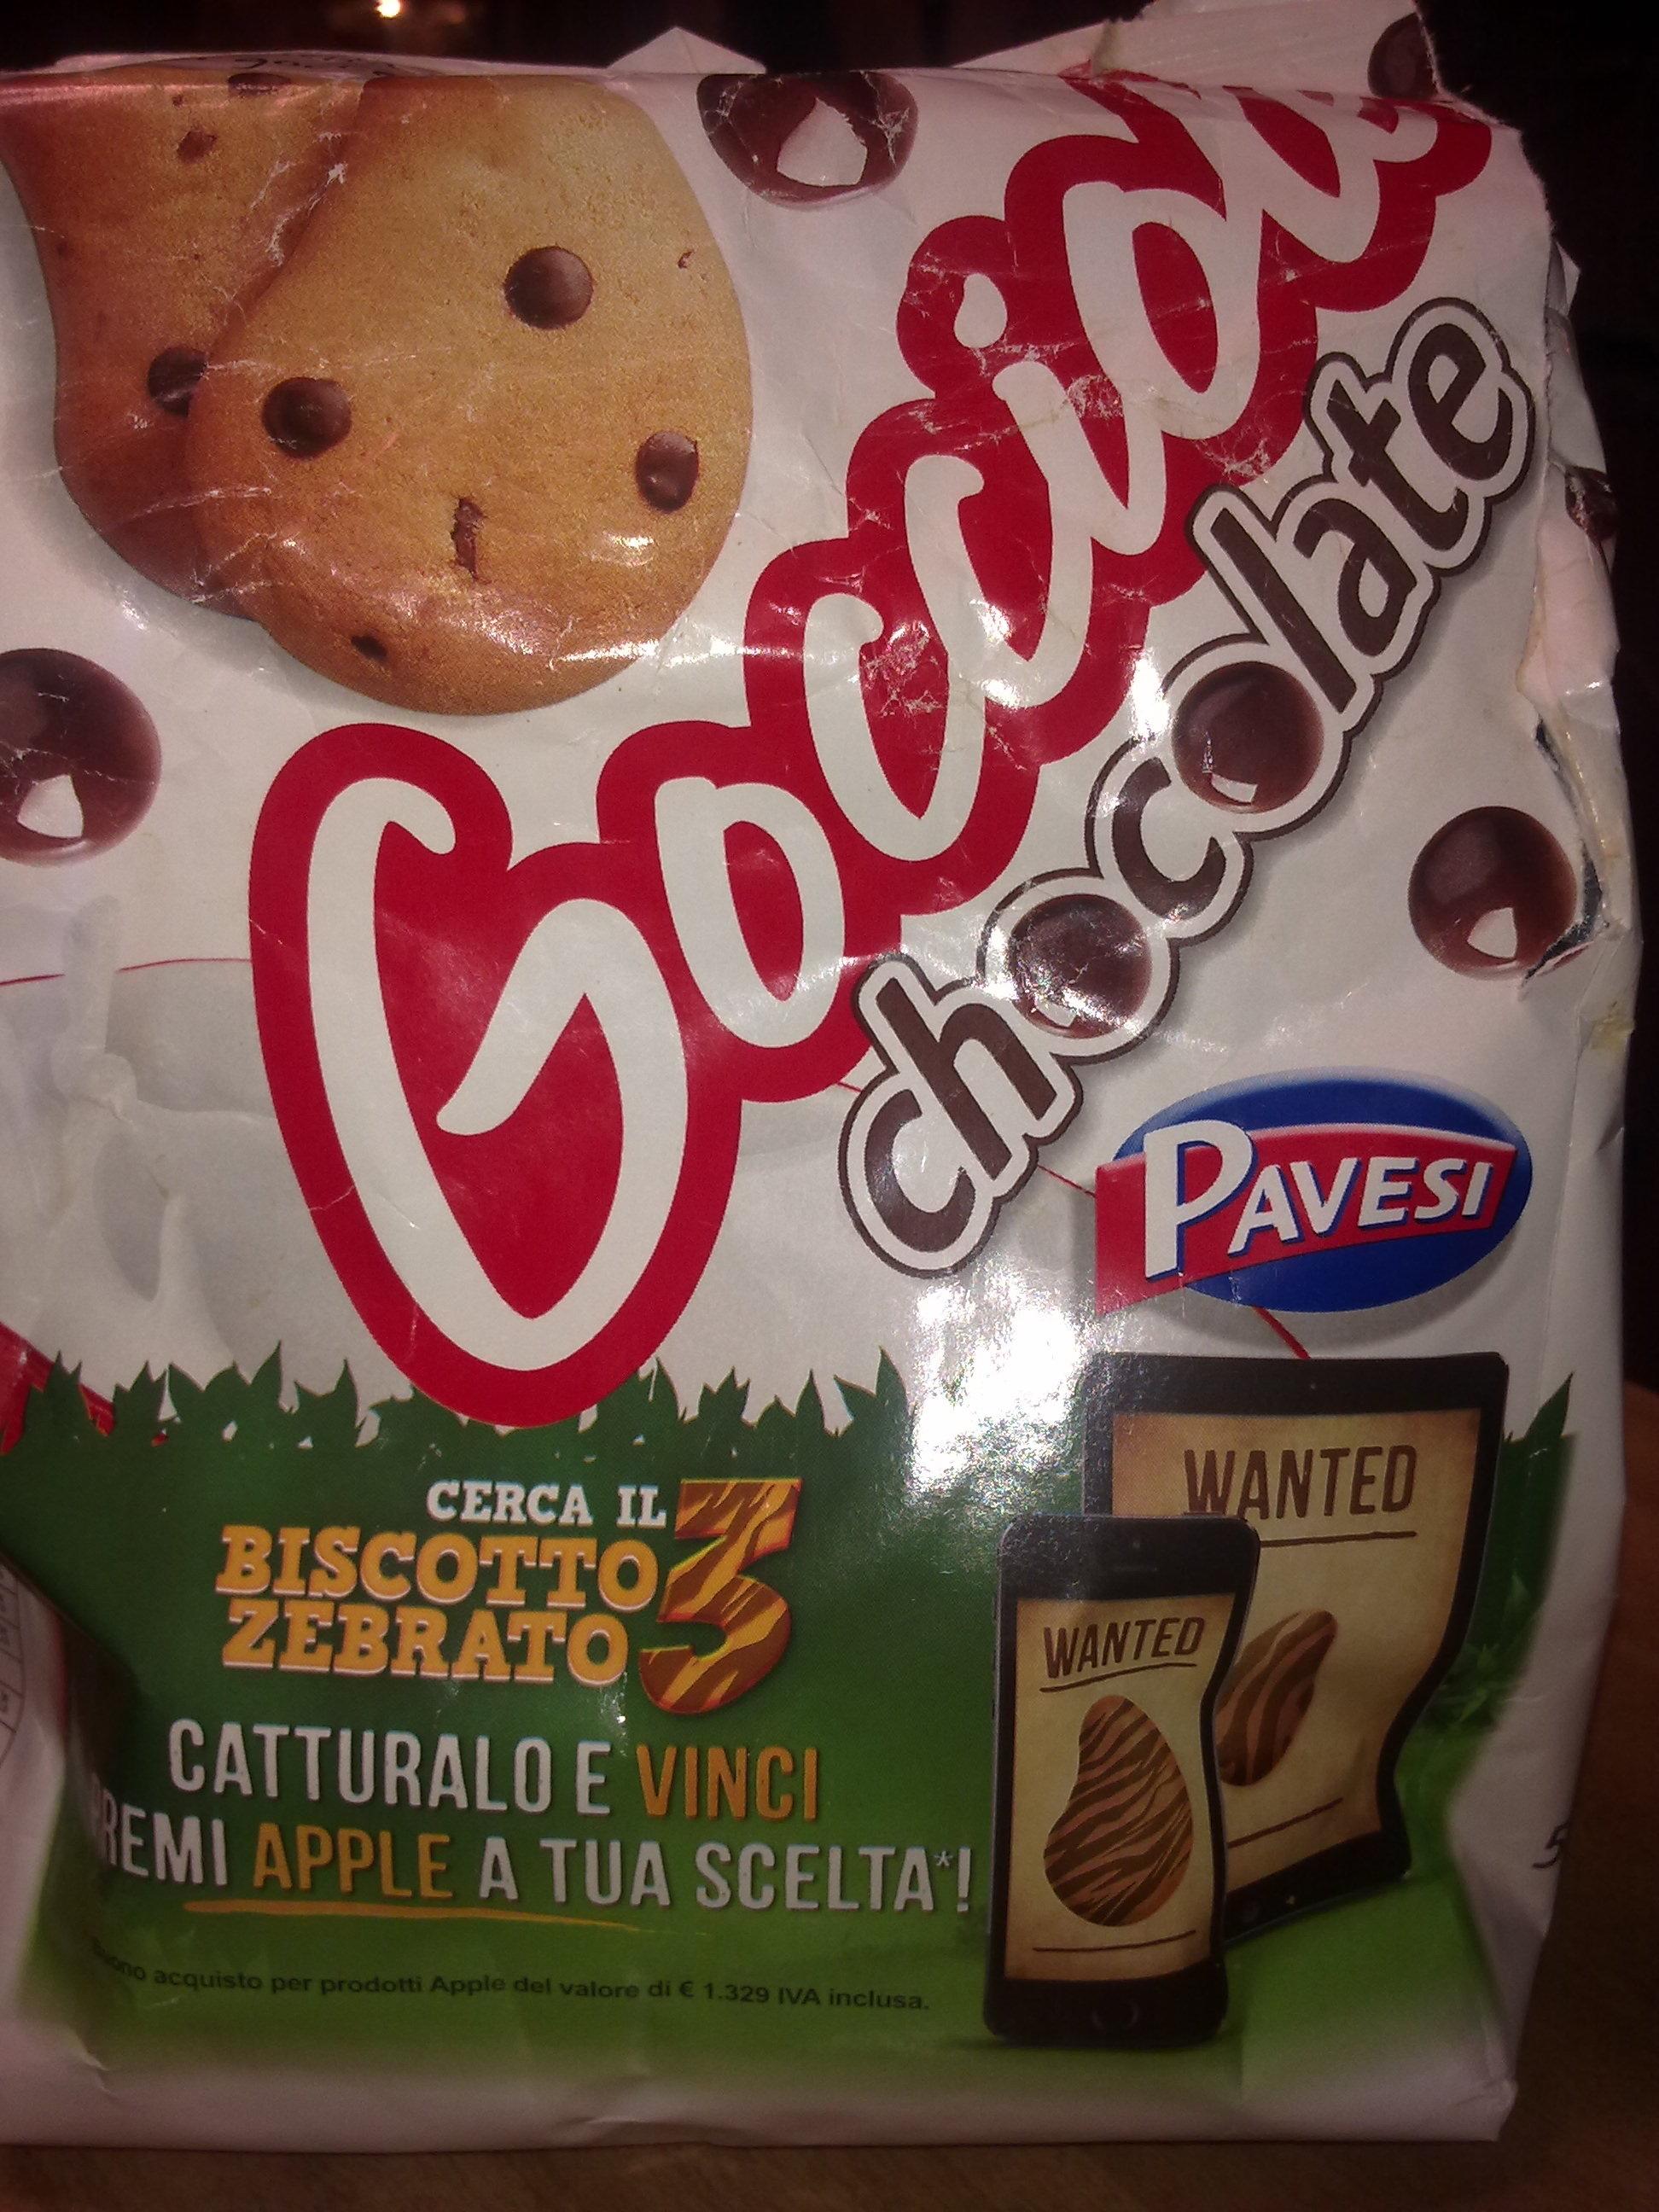 Gocciole chocolate Pavesi - Prodotto